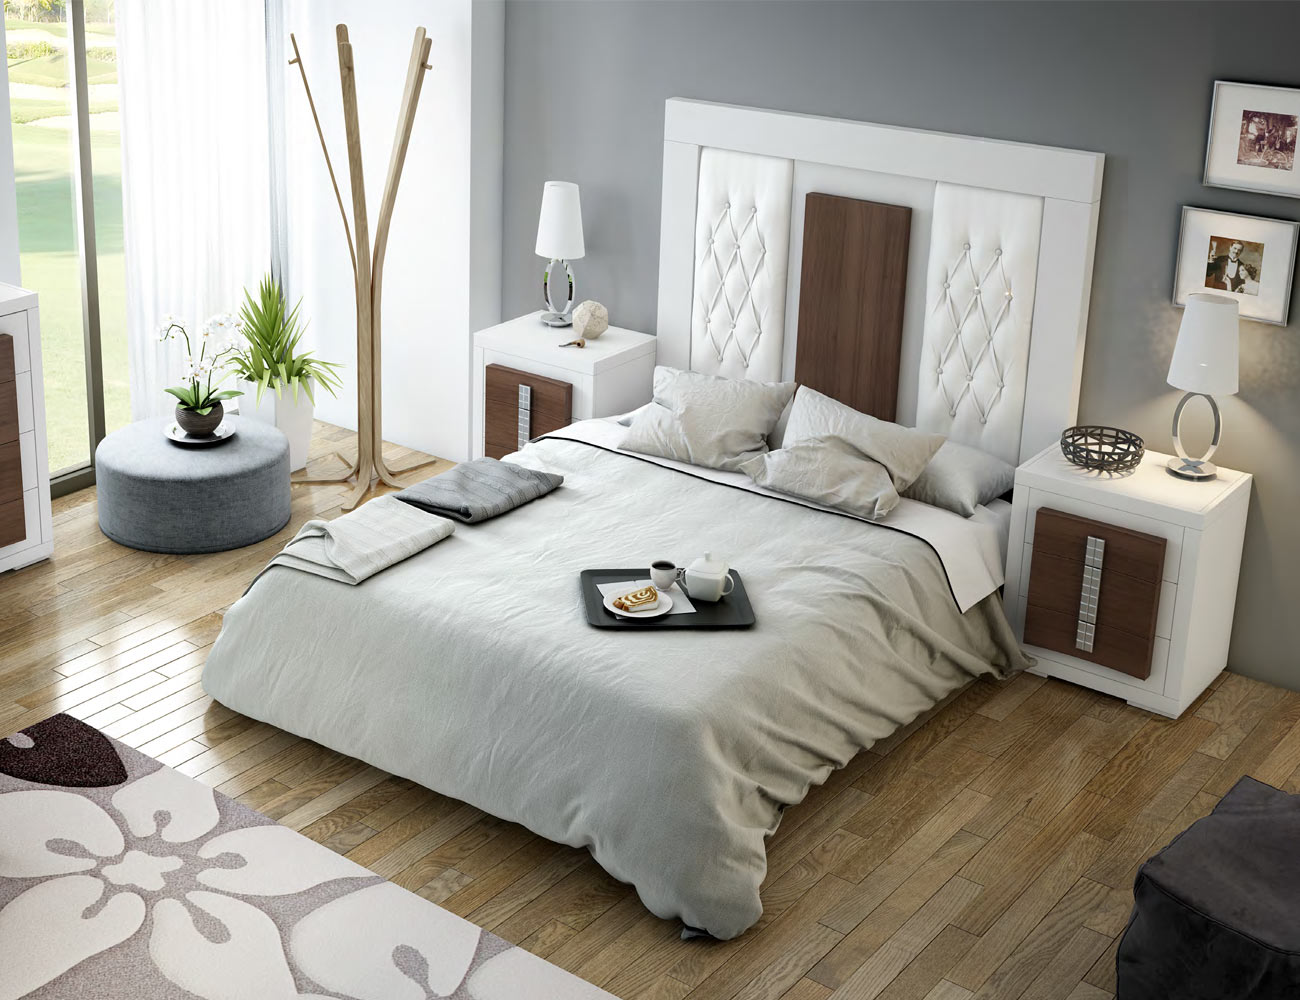 Dorm03 dormitorio matrimonio neoclasico blanco cubos nogal classic tapizado